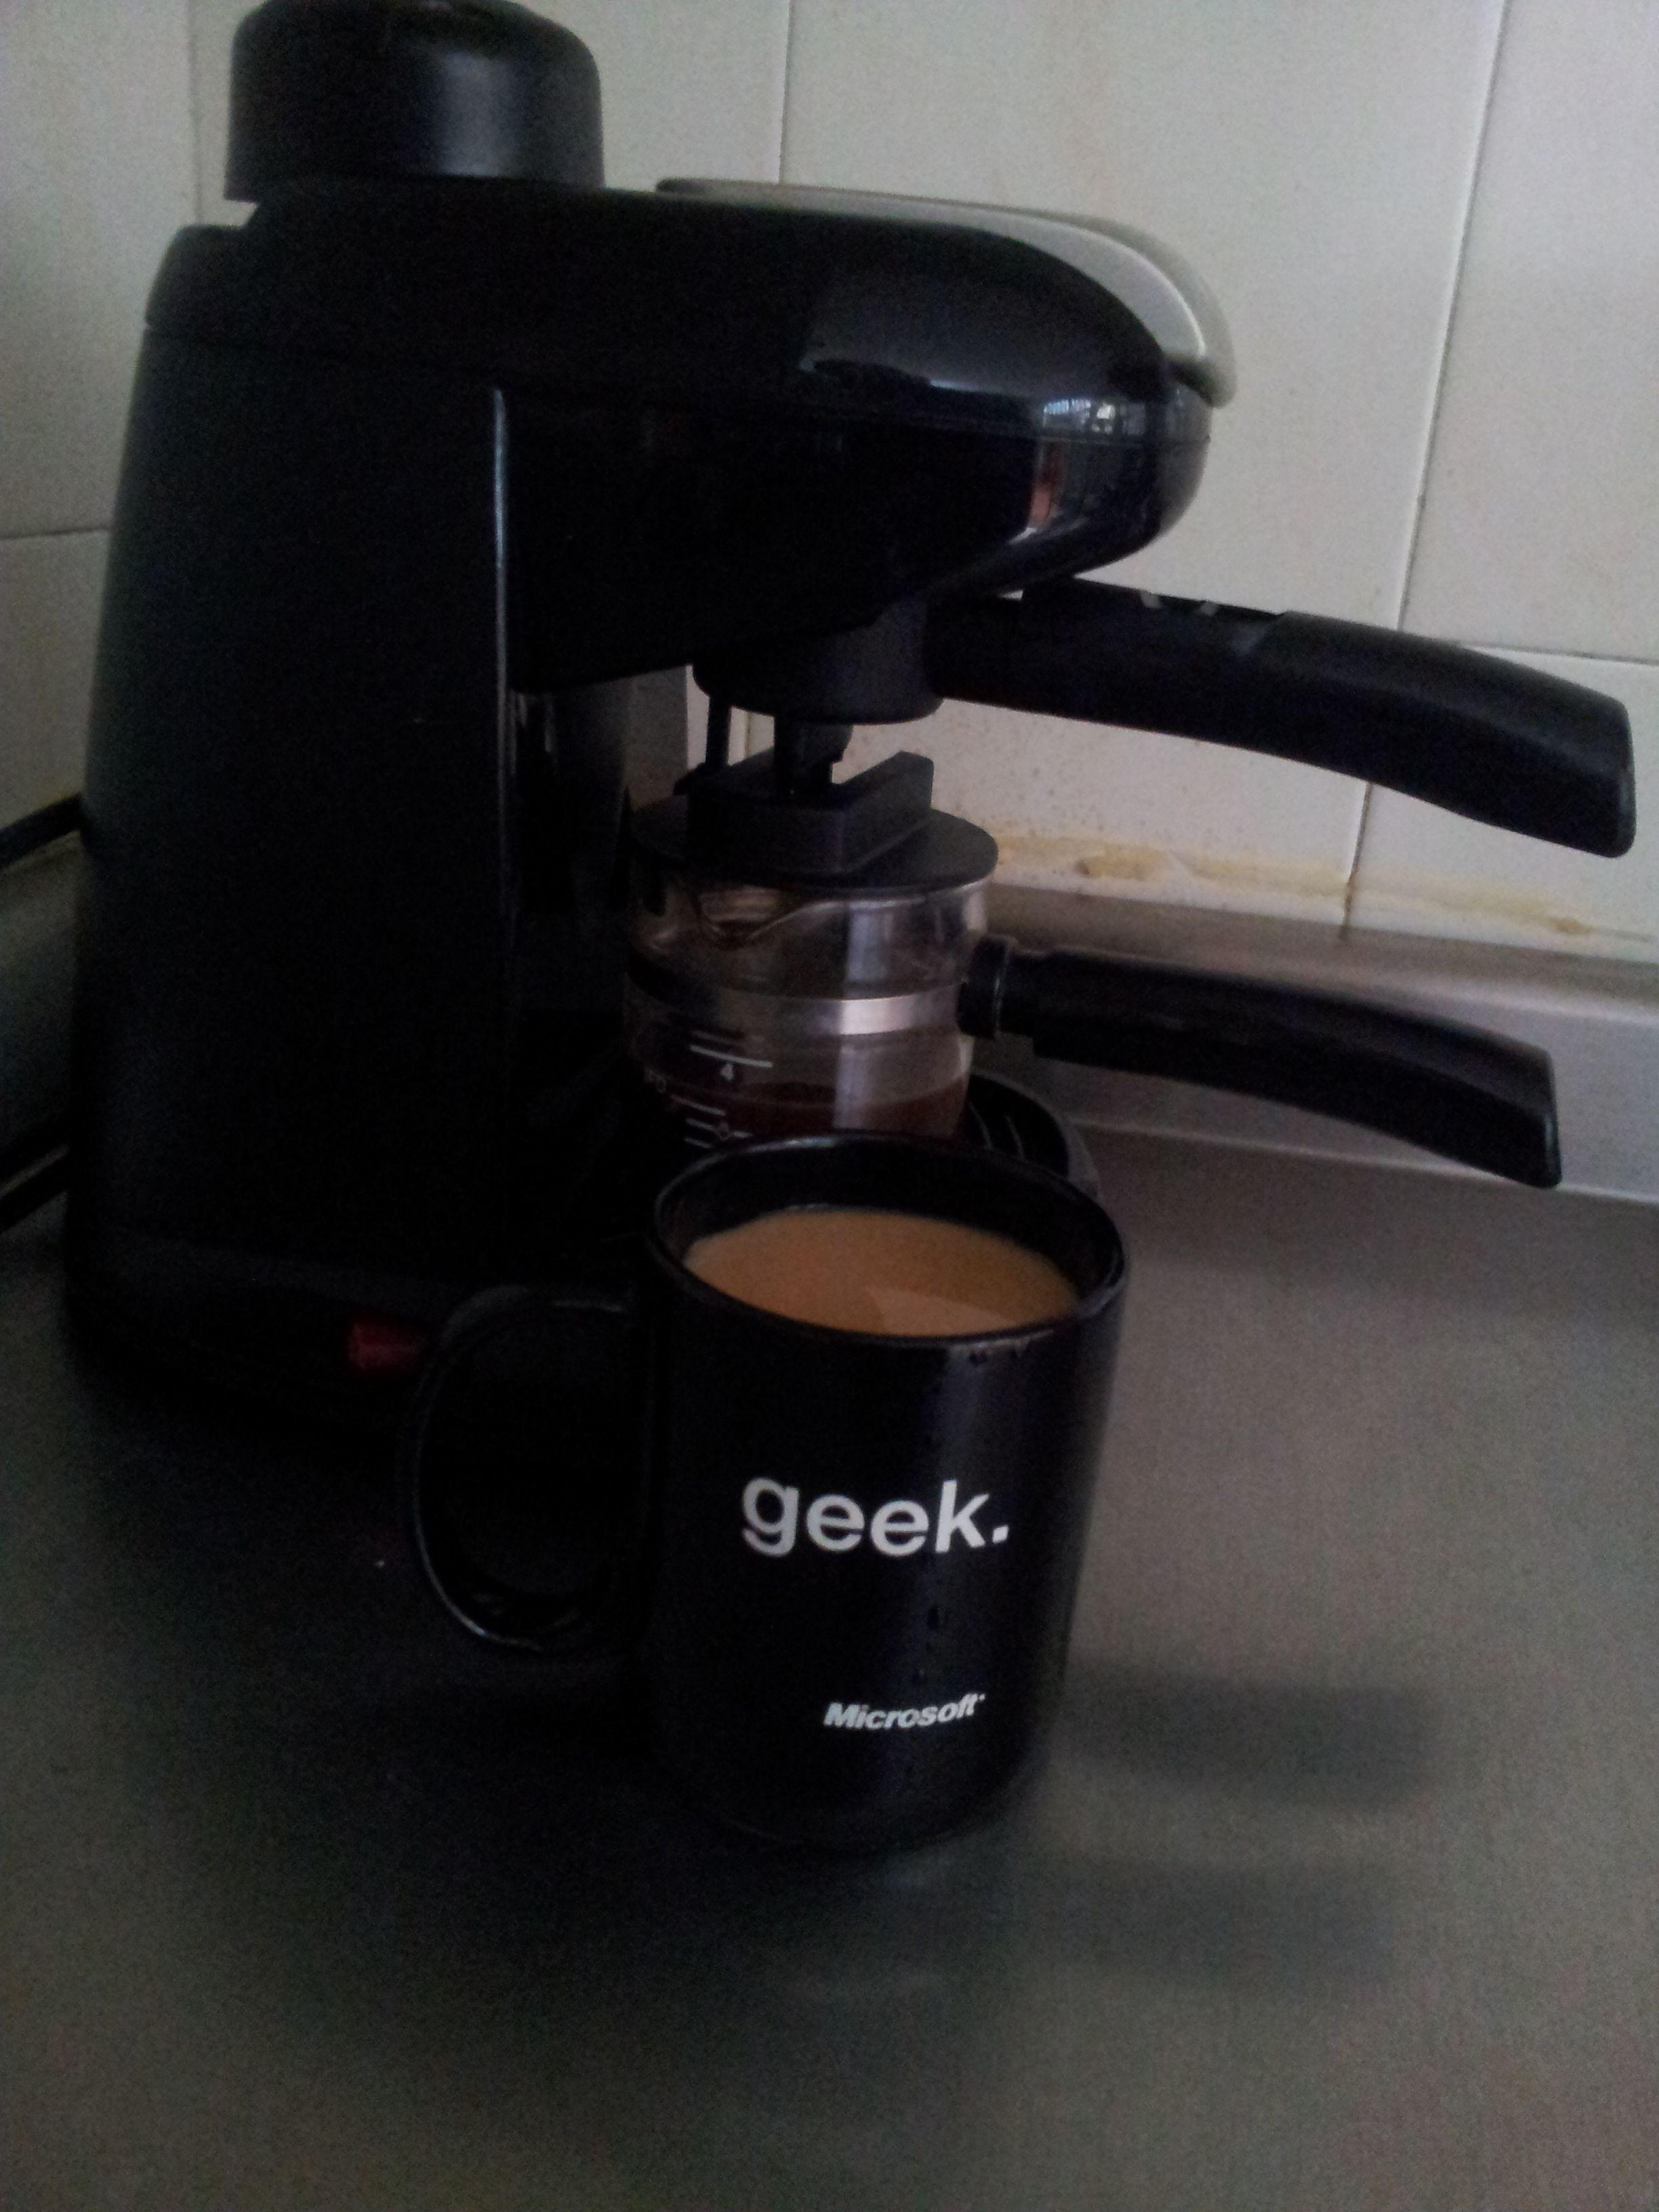 Café o Tinto? P Coffee, Coffee maker, Drip coffee maker